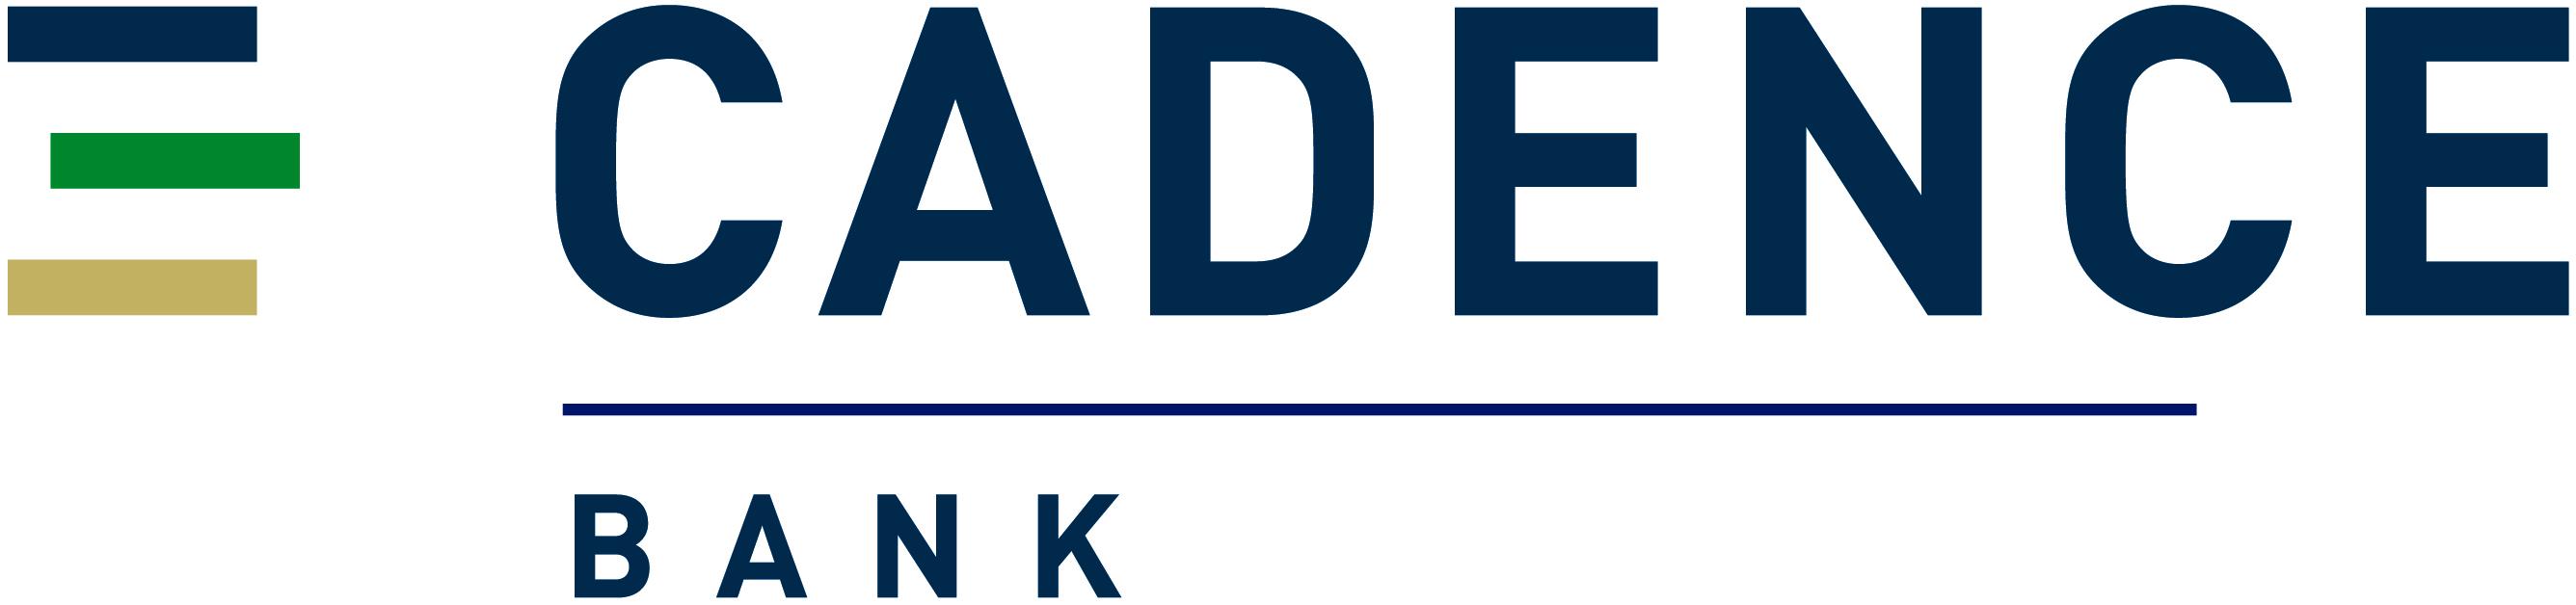 https://growthzonesitesprod.azureedge.net/wp-content/uploads/sites/1496/2020/03/CADENCE-logo-v1-stacked-1.jpg